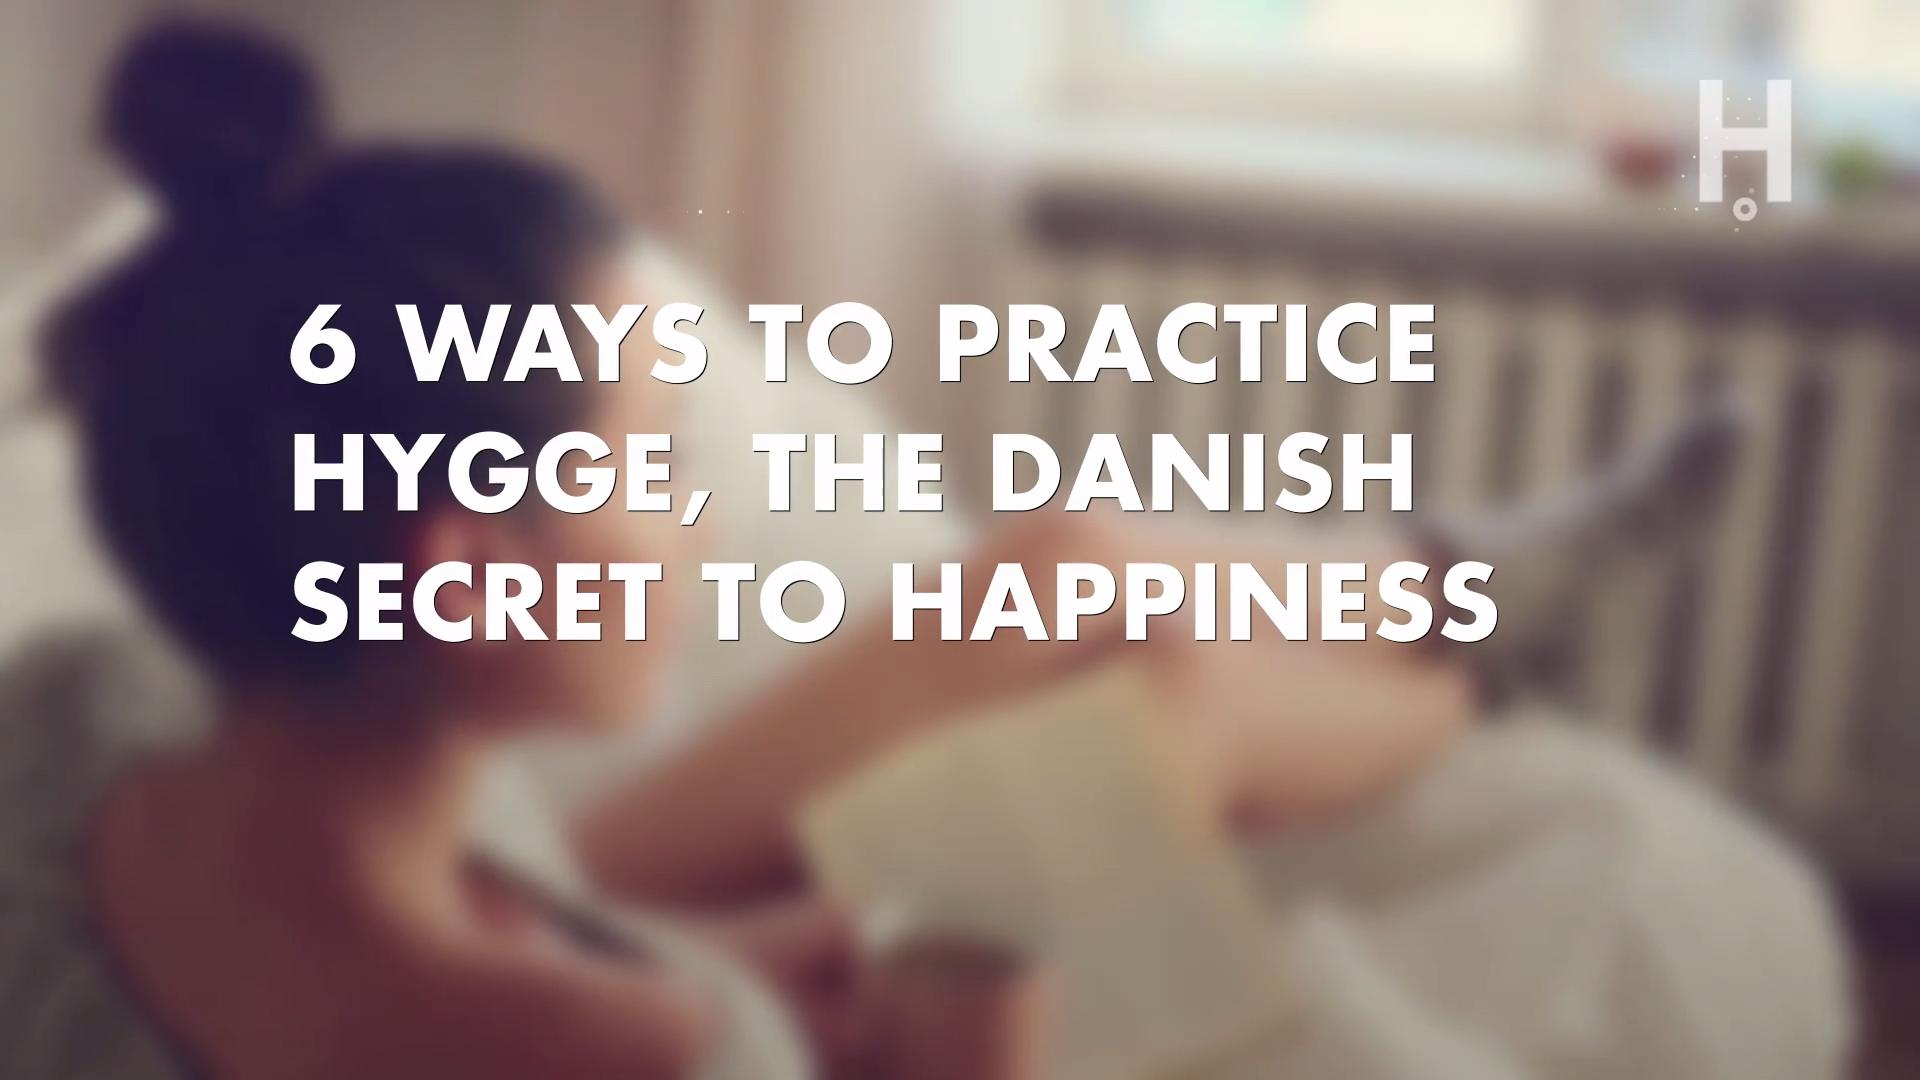 How to Practice Hygge How to Practice Hygge new pics